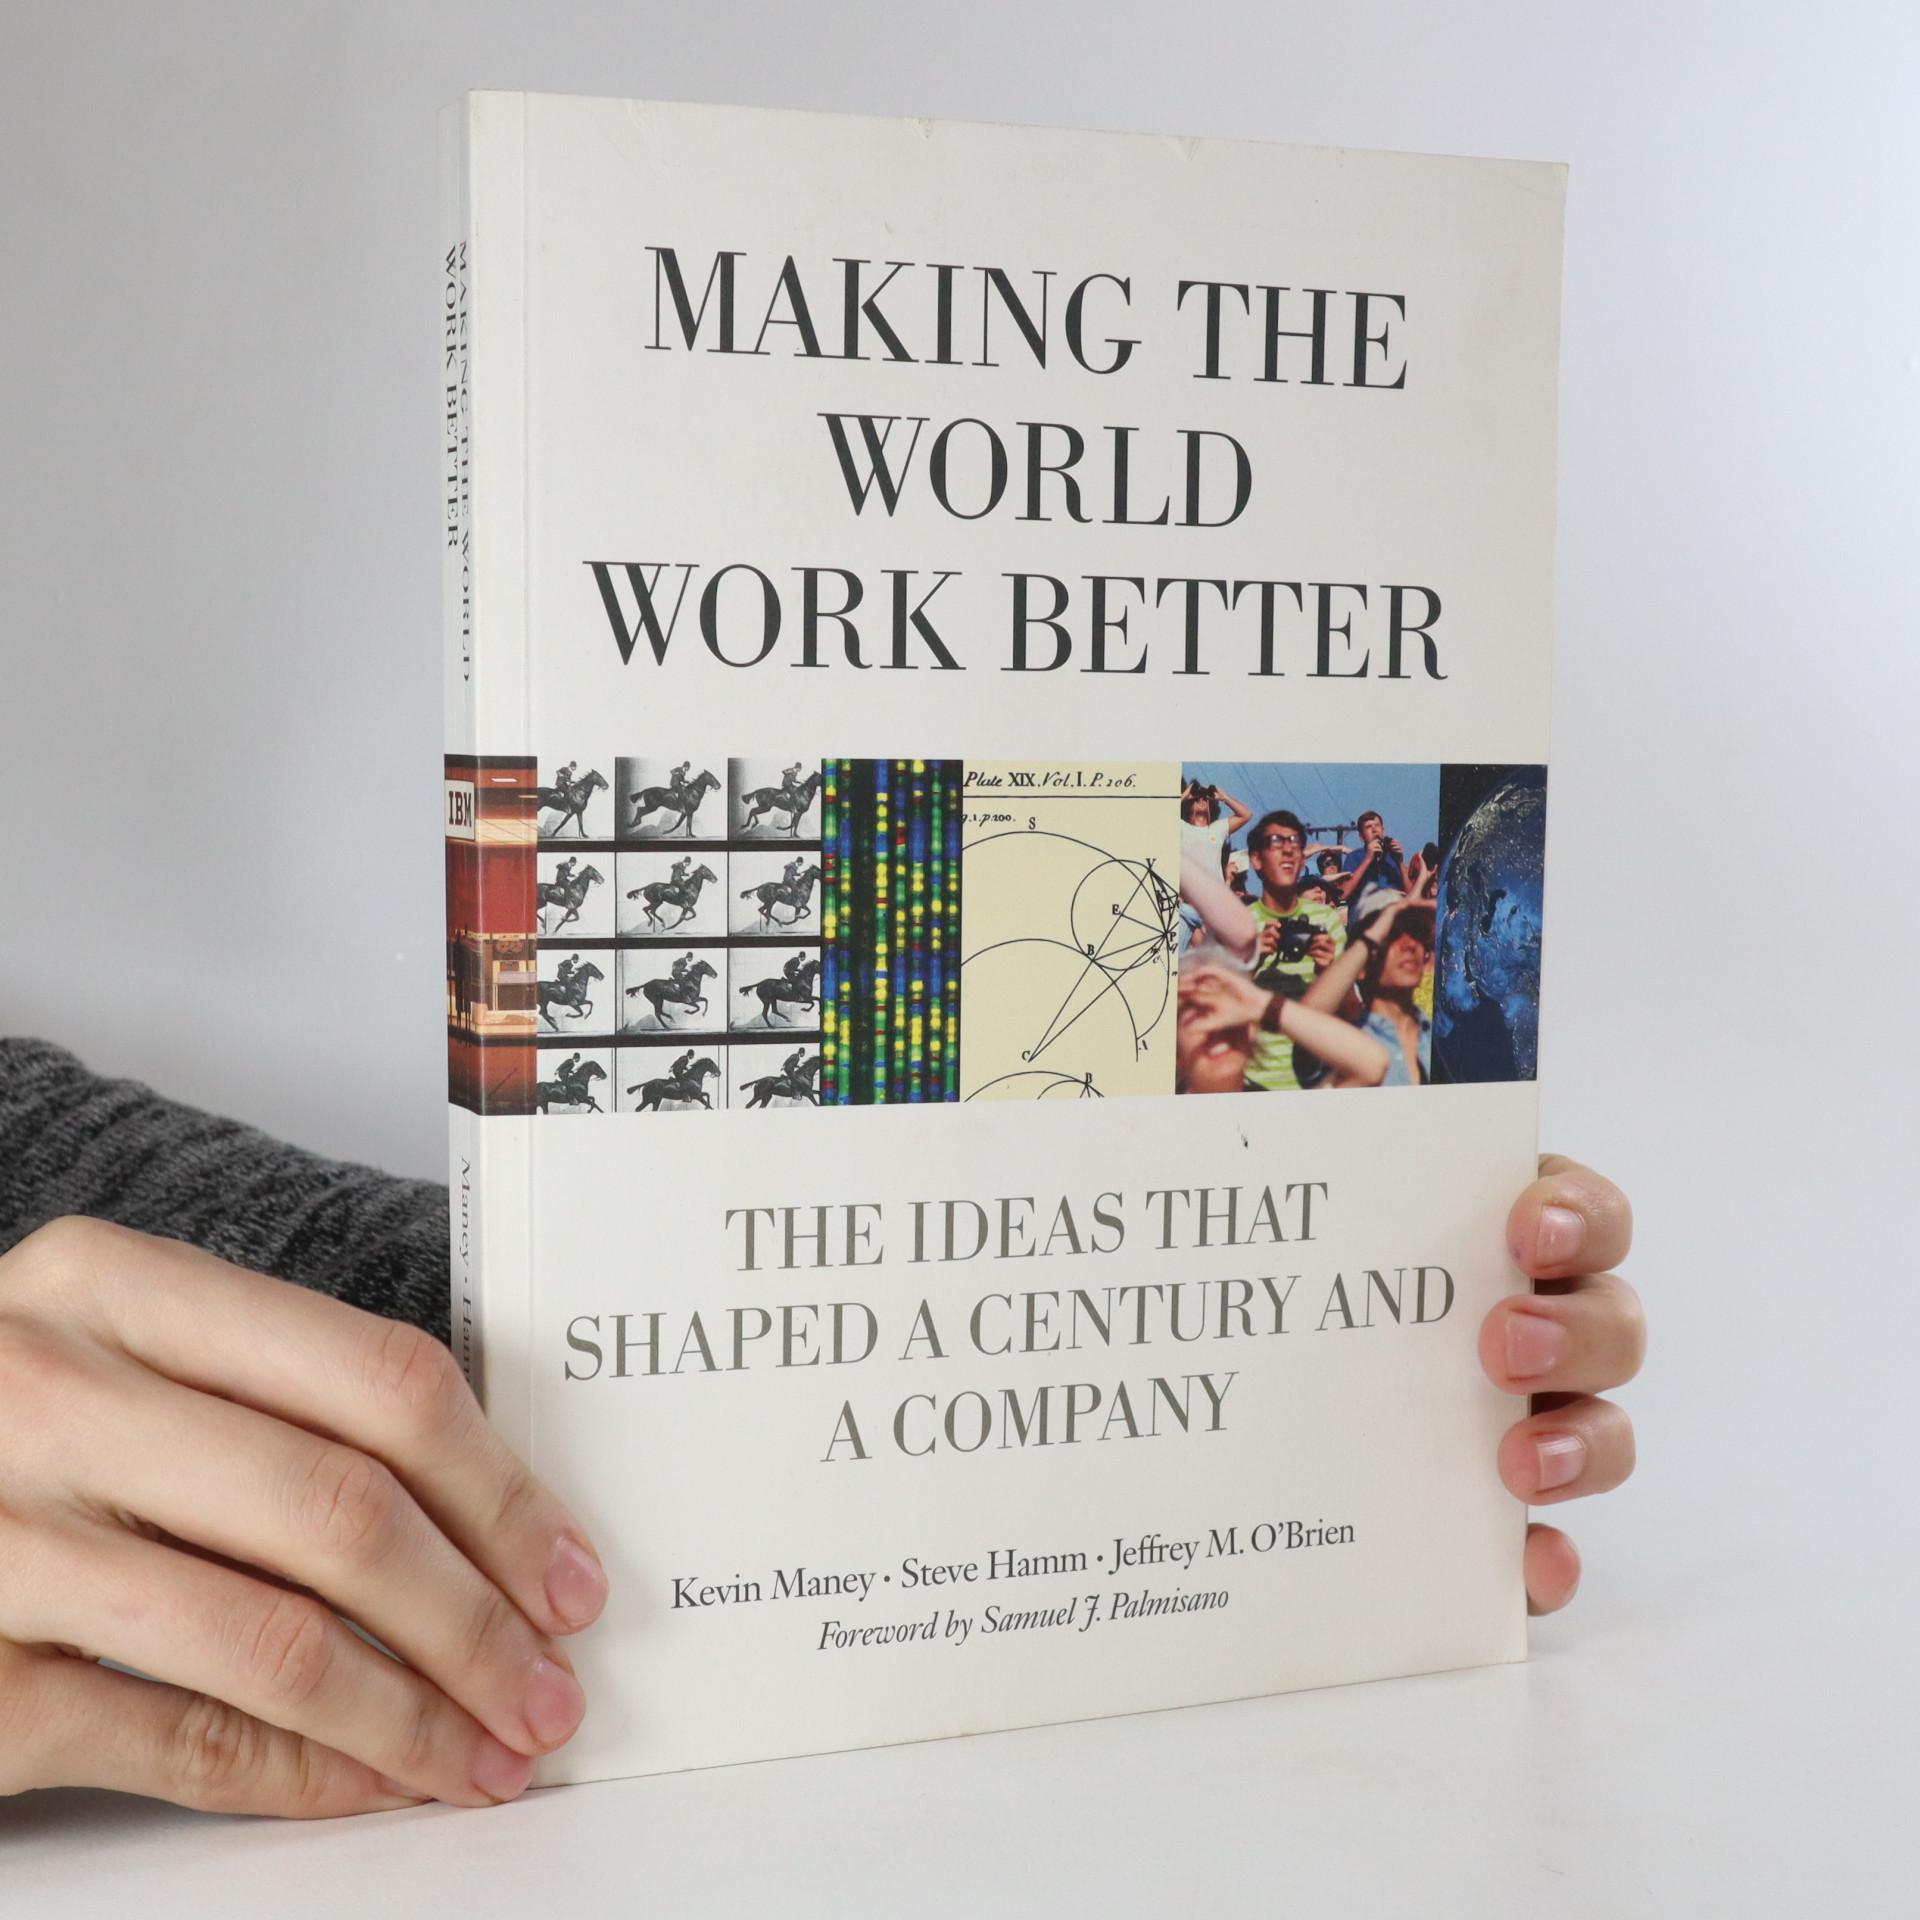 antikvární kniha Making the World Work Better, neuveden